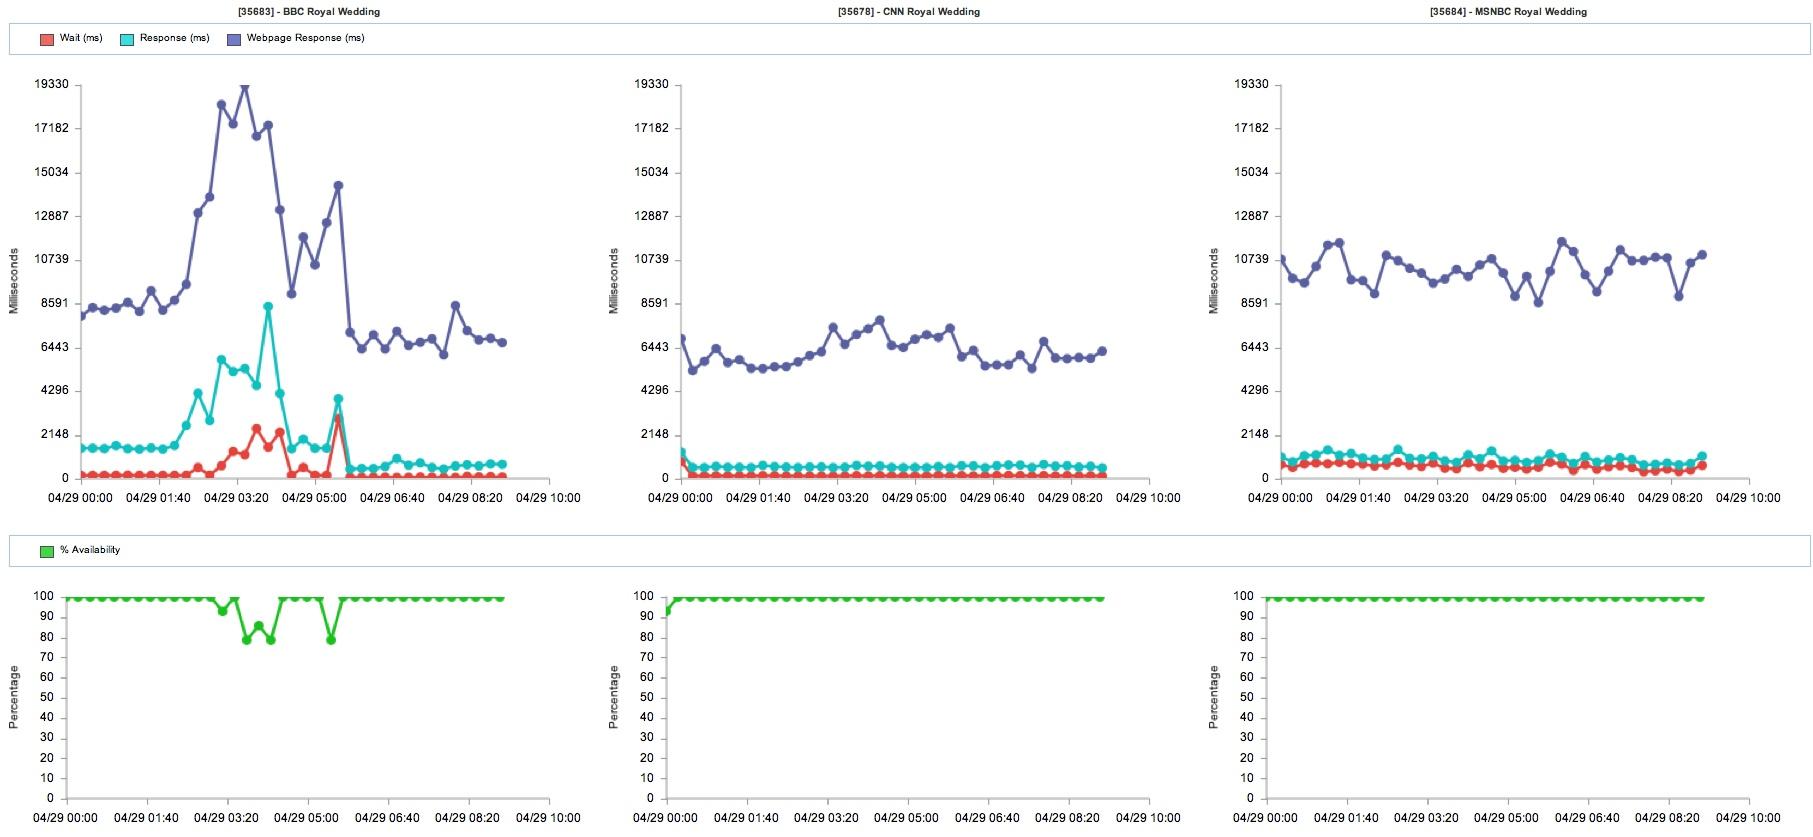 Web performance of news websites during royal wedding